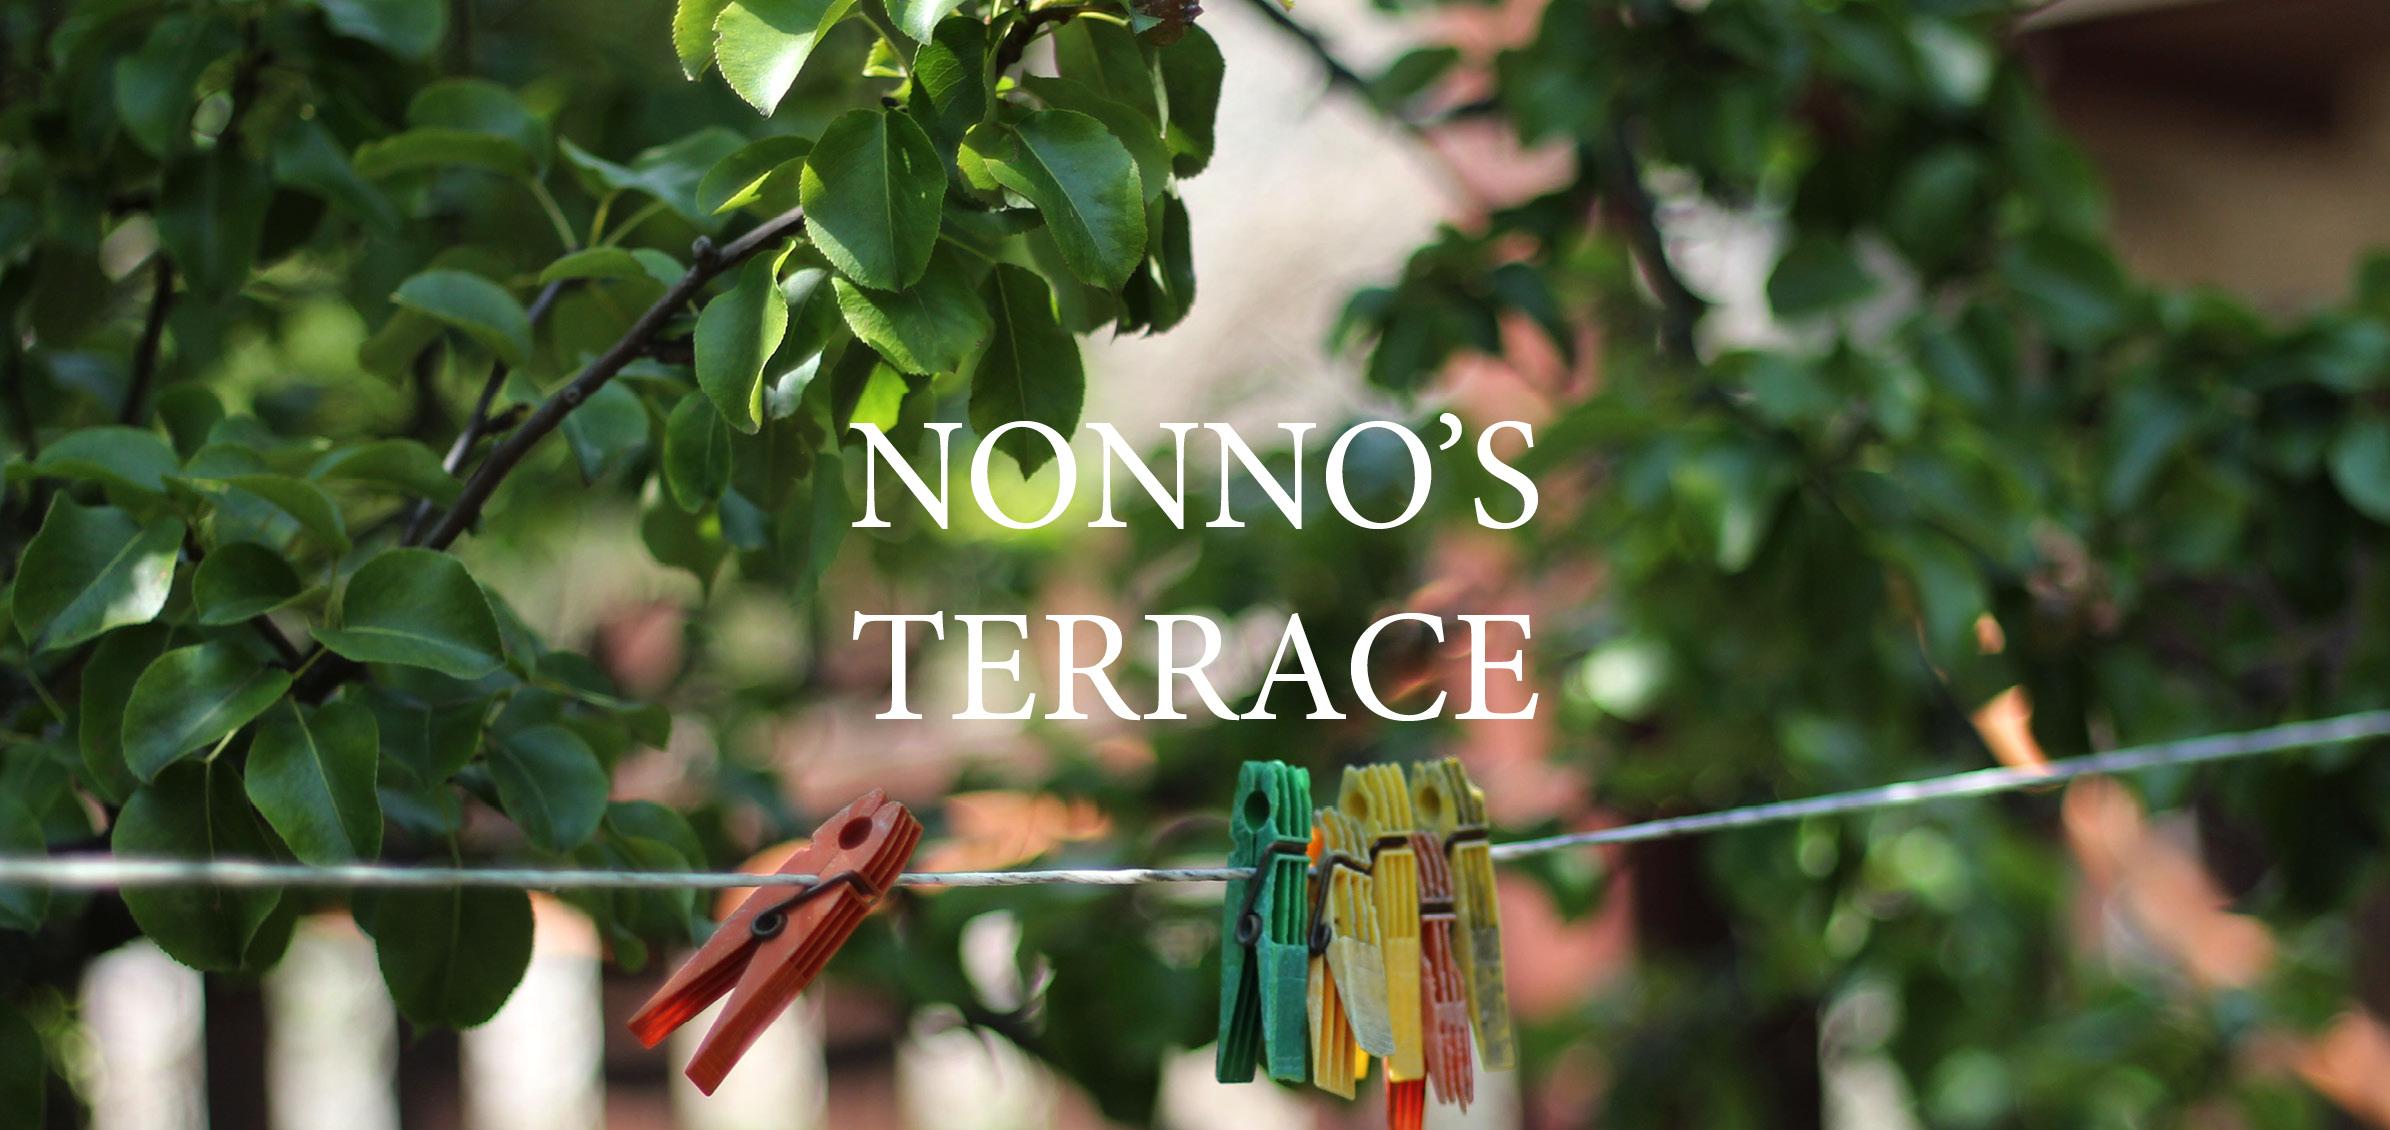 Rice & Shine - Travel Blog - Nonno's Terrace 1 .jpg